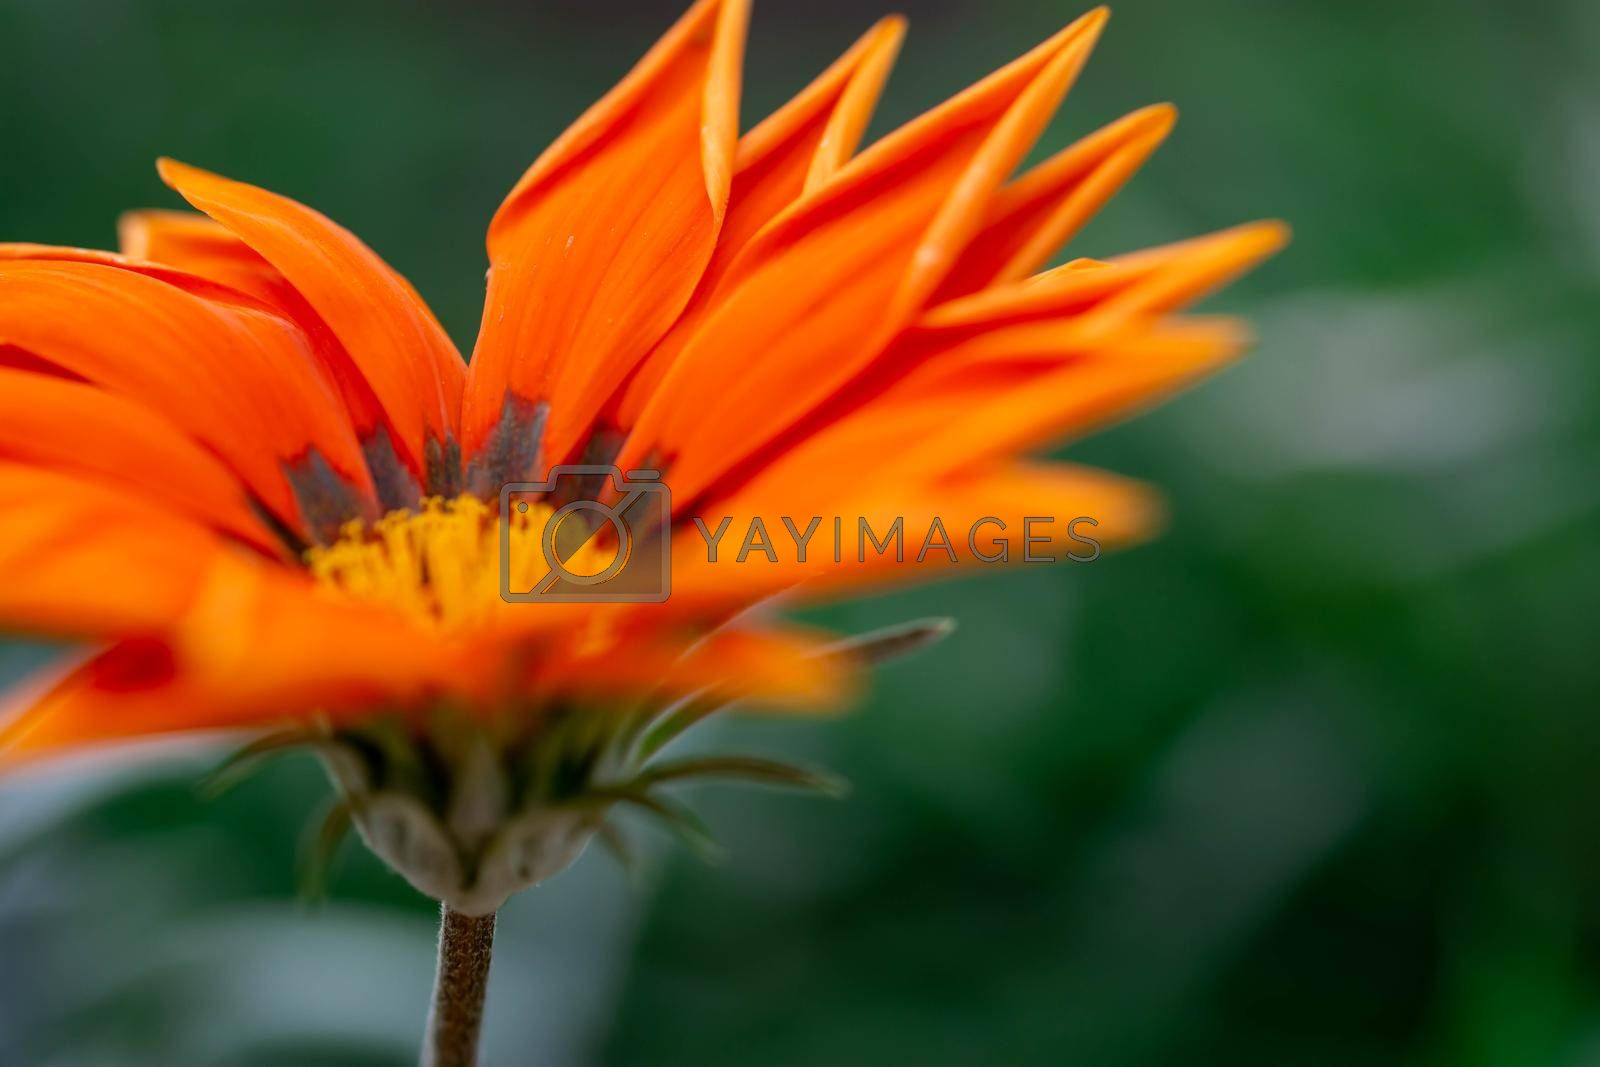 Macro shot of orange flower with blurry green background in a flower garden in Singapore